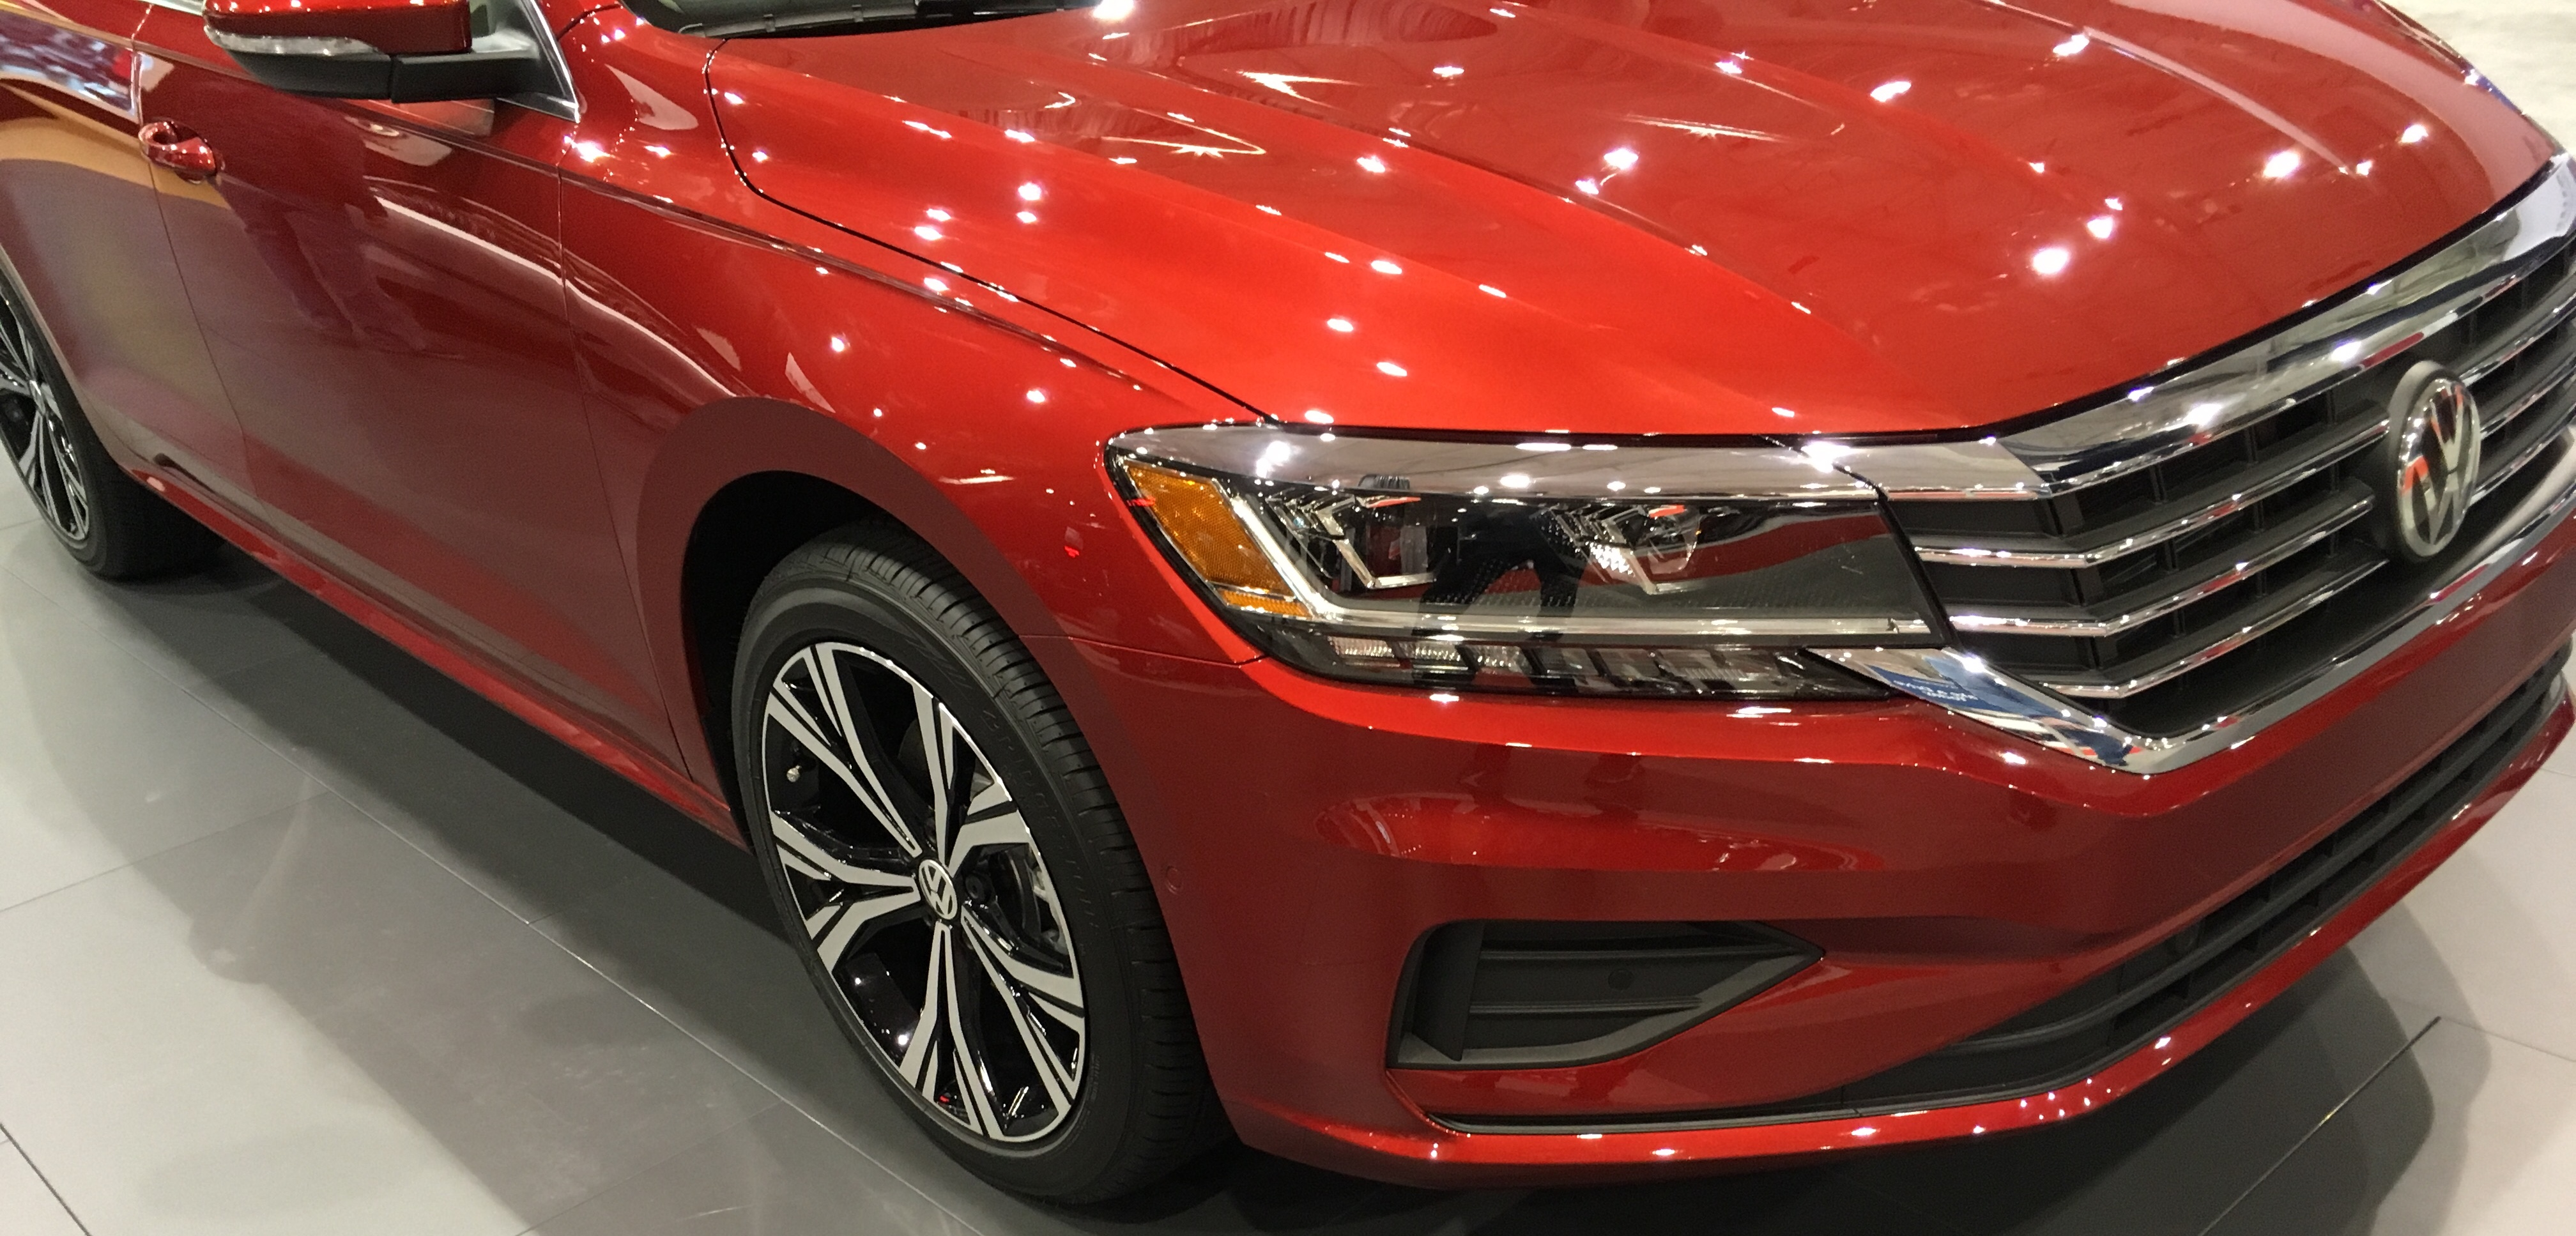 Auto Show 2020 Cleveland.File 2020 Volkswagen Passat Nms Cleveland Auto Show Jpg